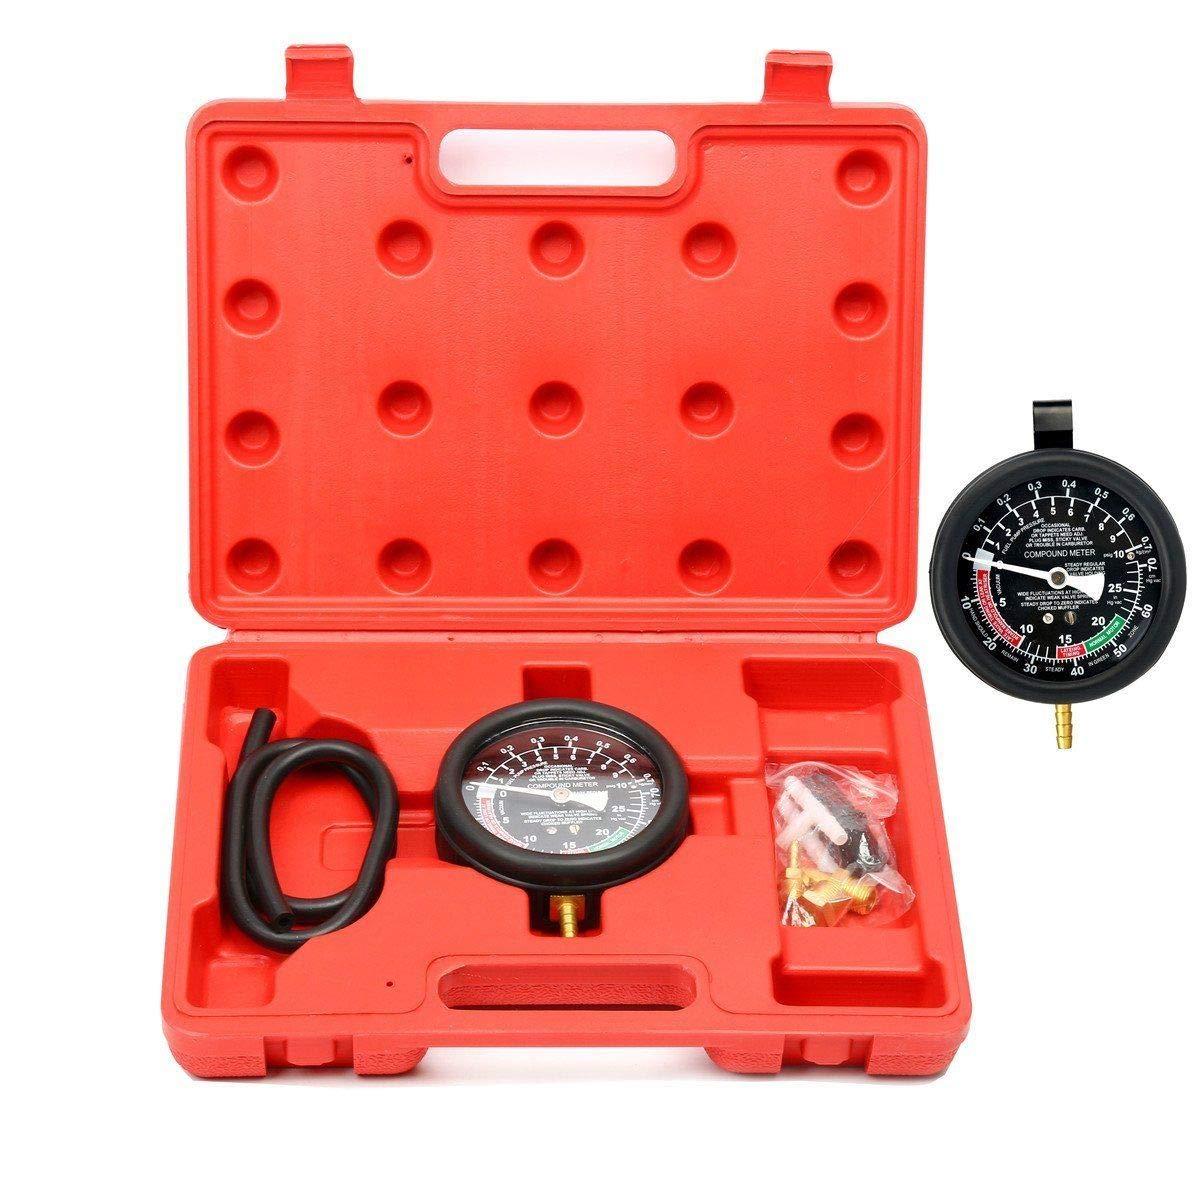 BSTOOL Carburetor Valve Fuel Pump Pressure & Vacuum Tester Gauge Test Kit Car Truck